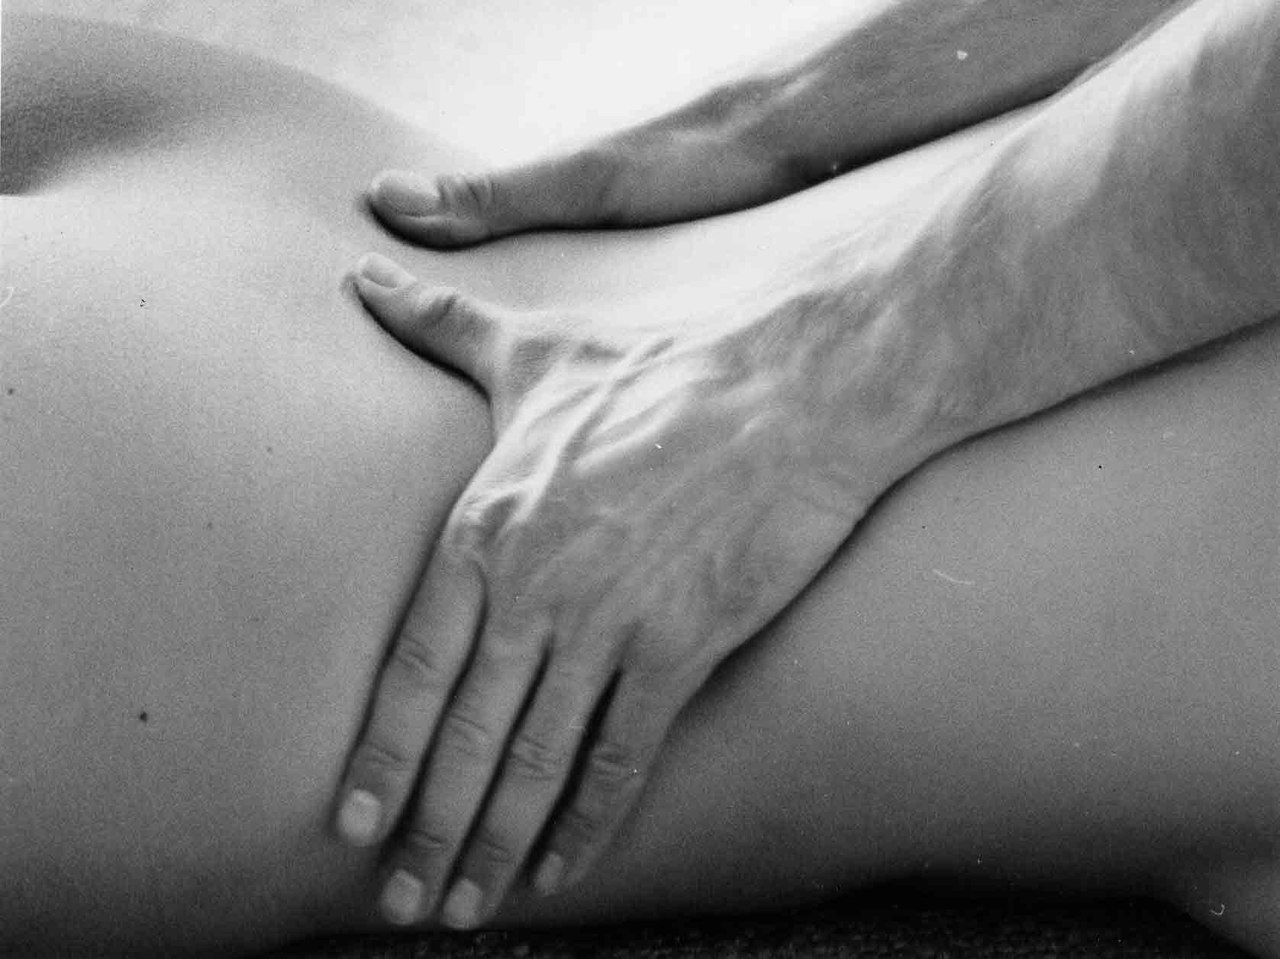 массаж голый, массаж интимный женщине, трахалась с массажистом,